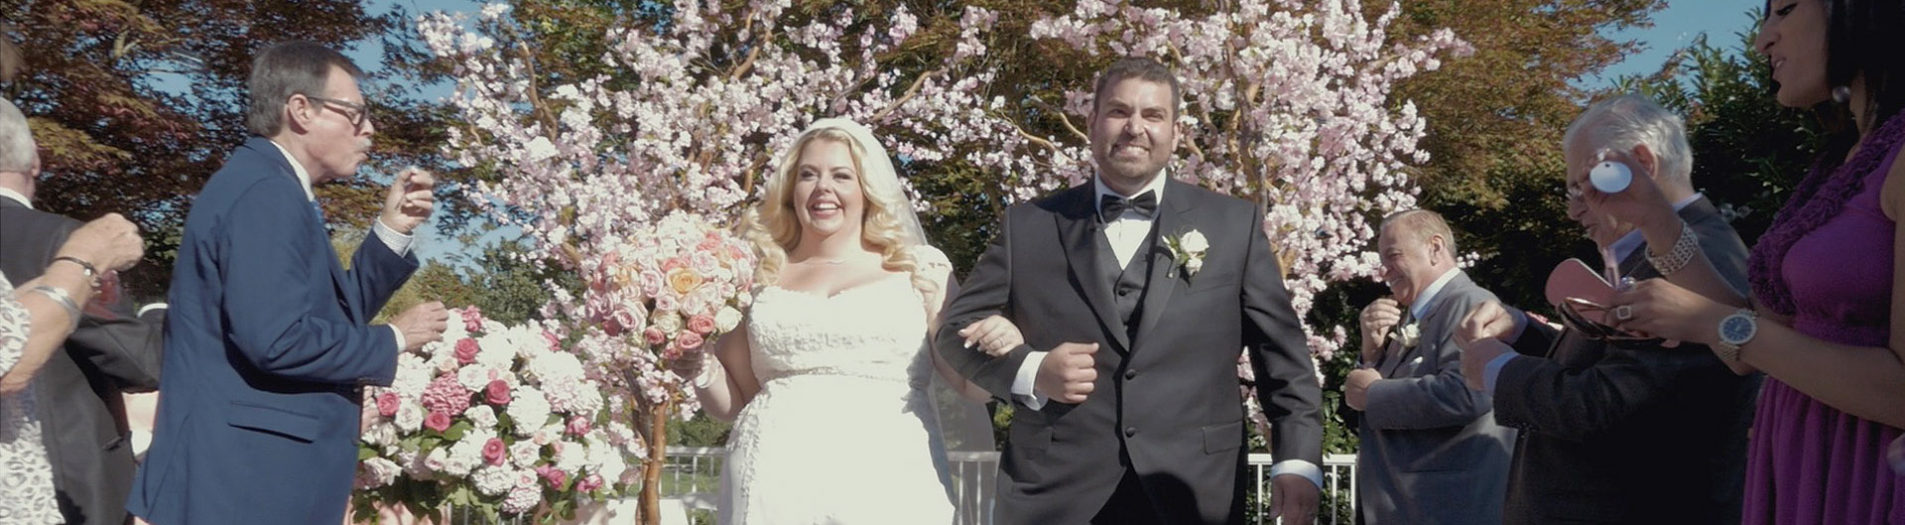 Tara & Will | Same Day Edit + Highlight Film | Swan-e-set Bay Resort, Maple Ridge, BC